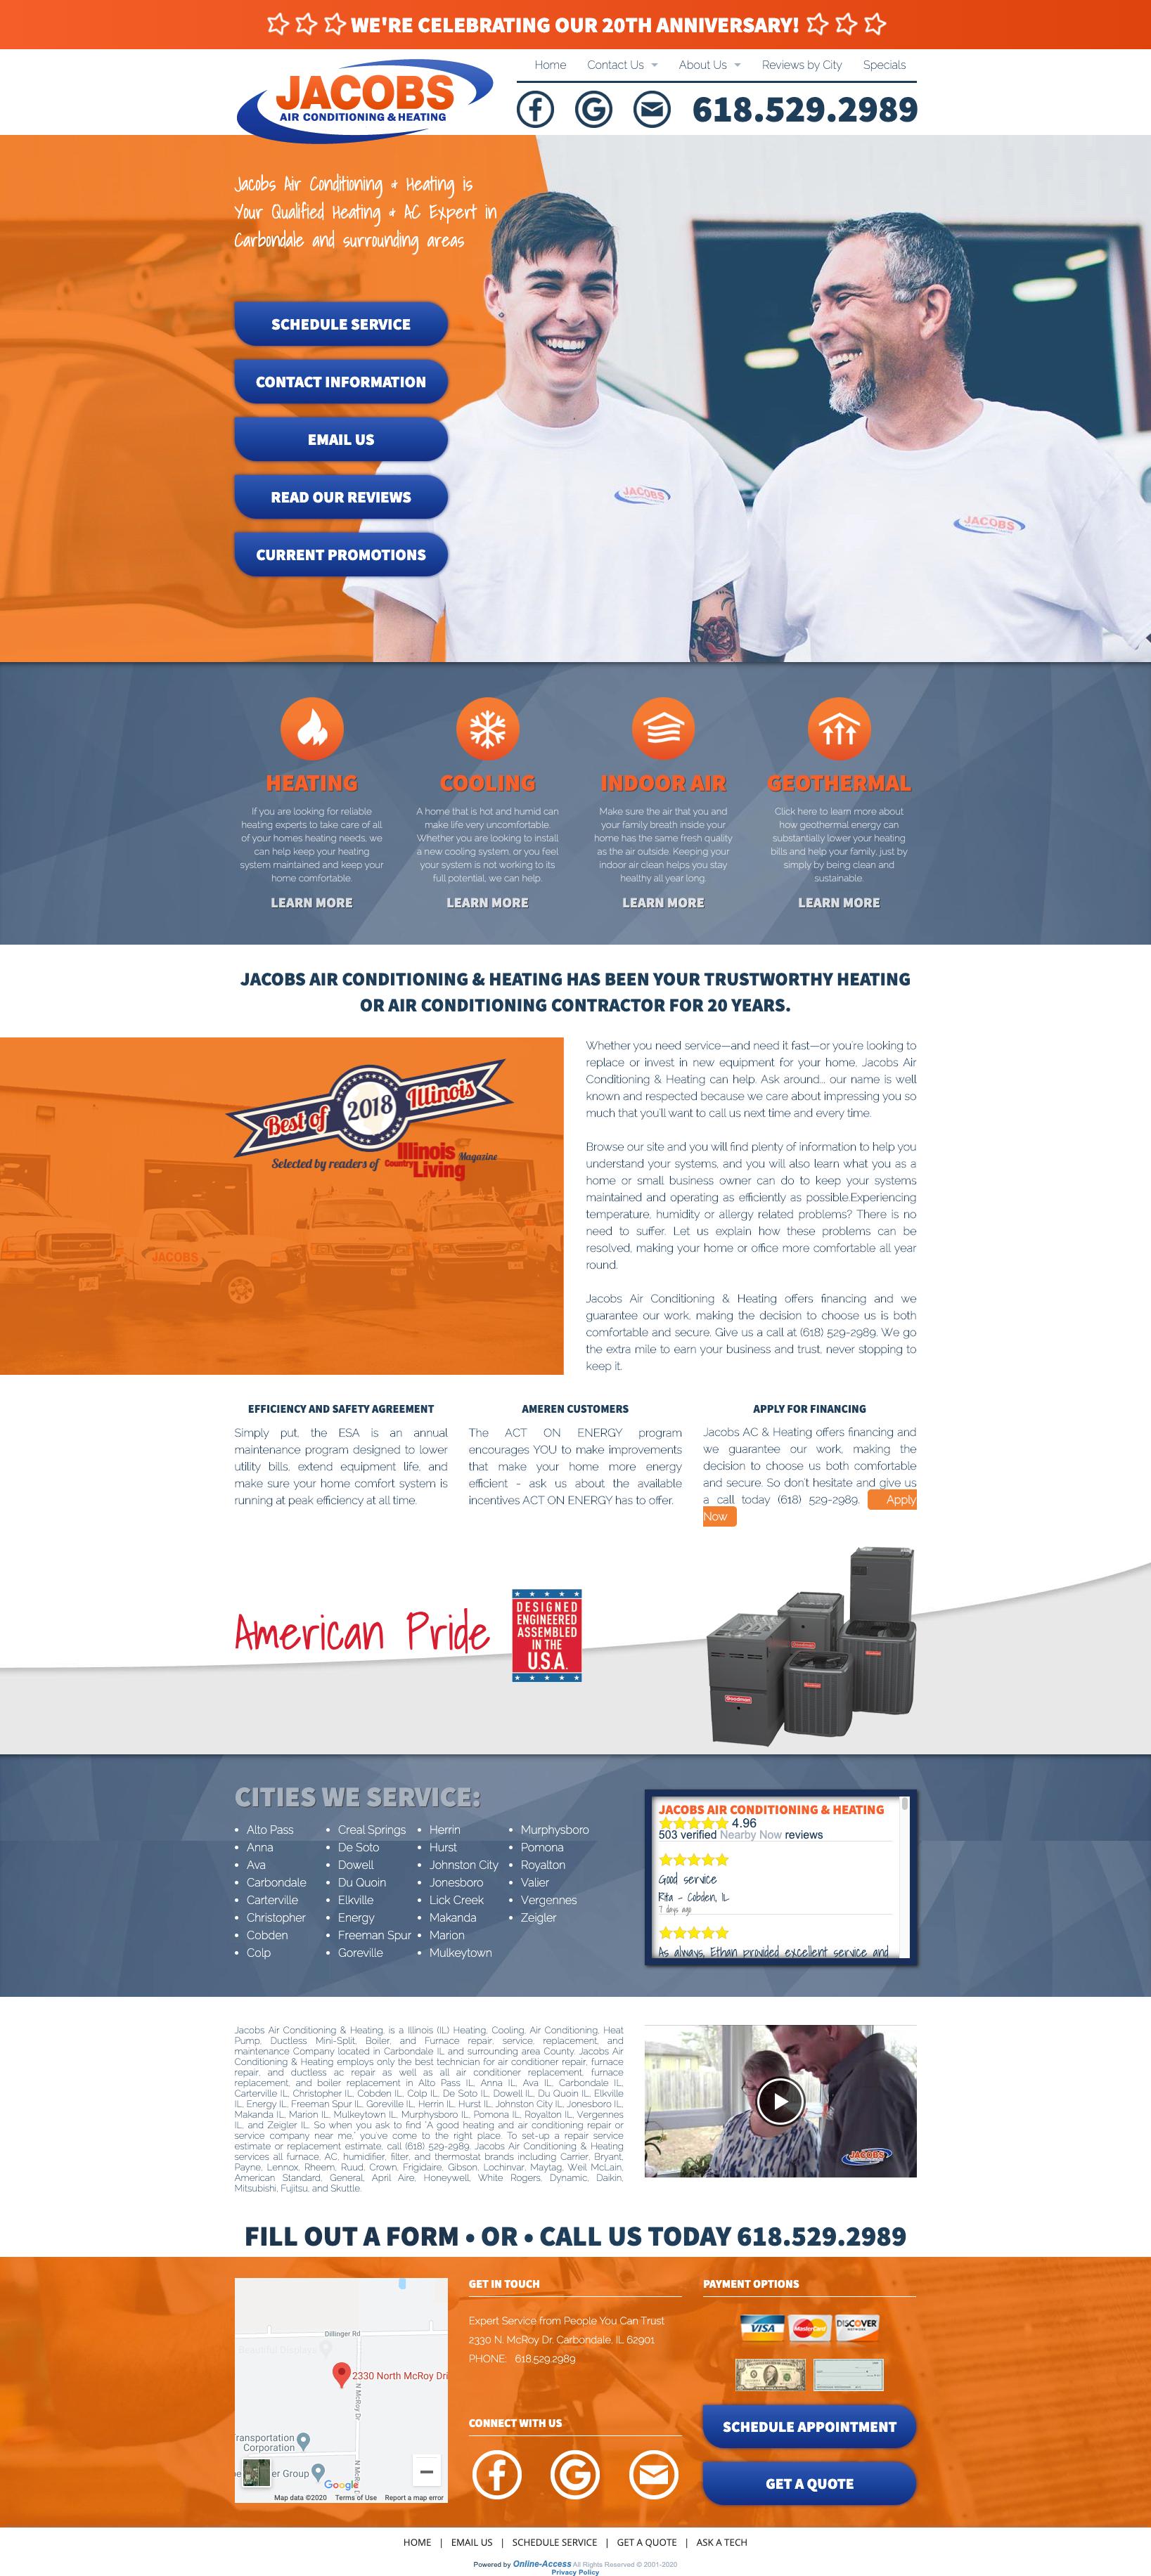 Branded Website Design in 2020 Branding website design